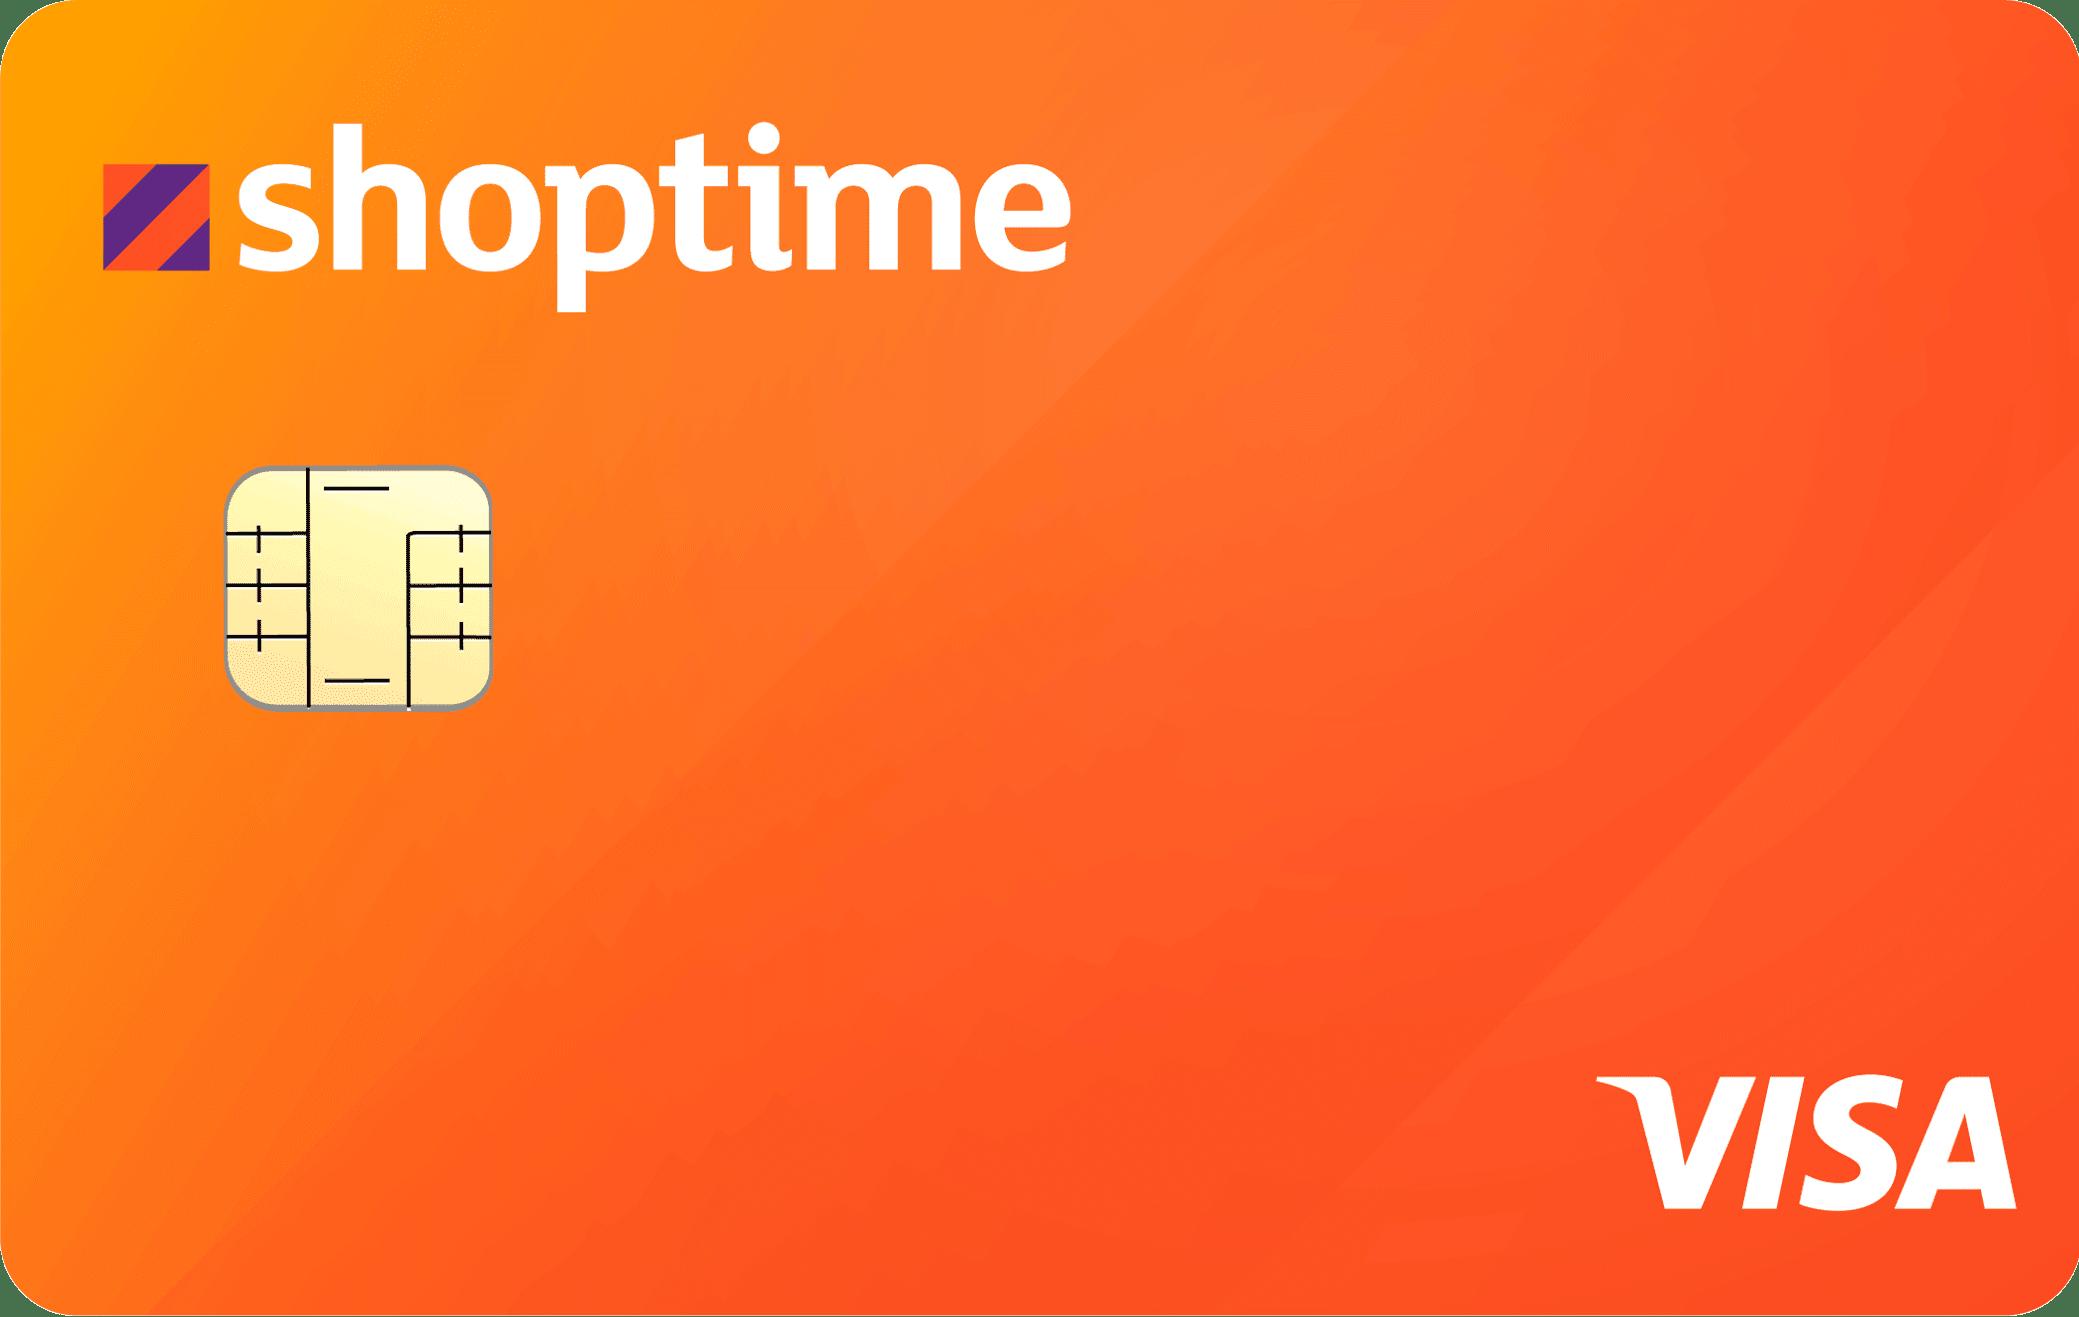 cartao-shoptime-visa